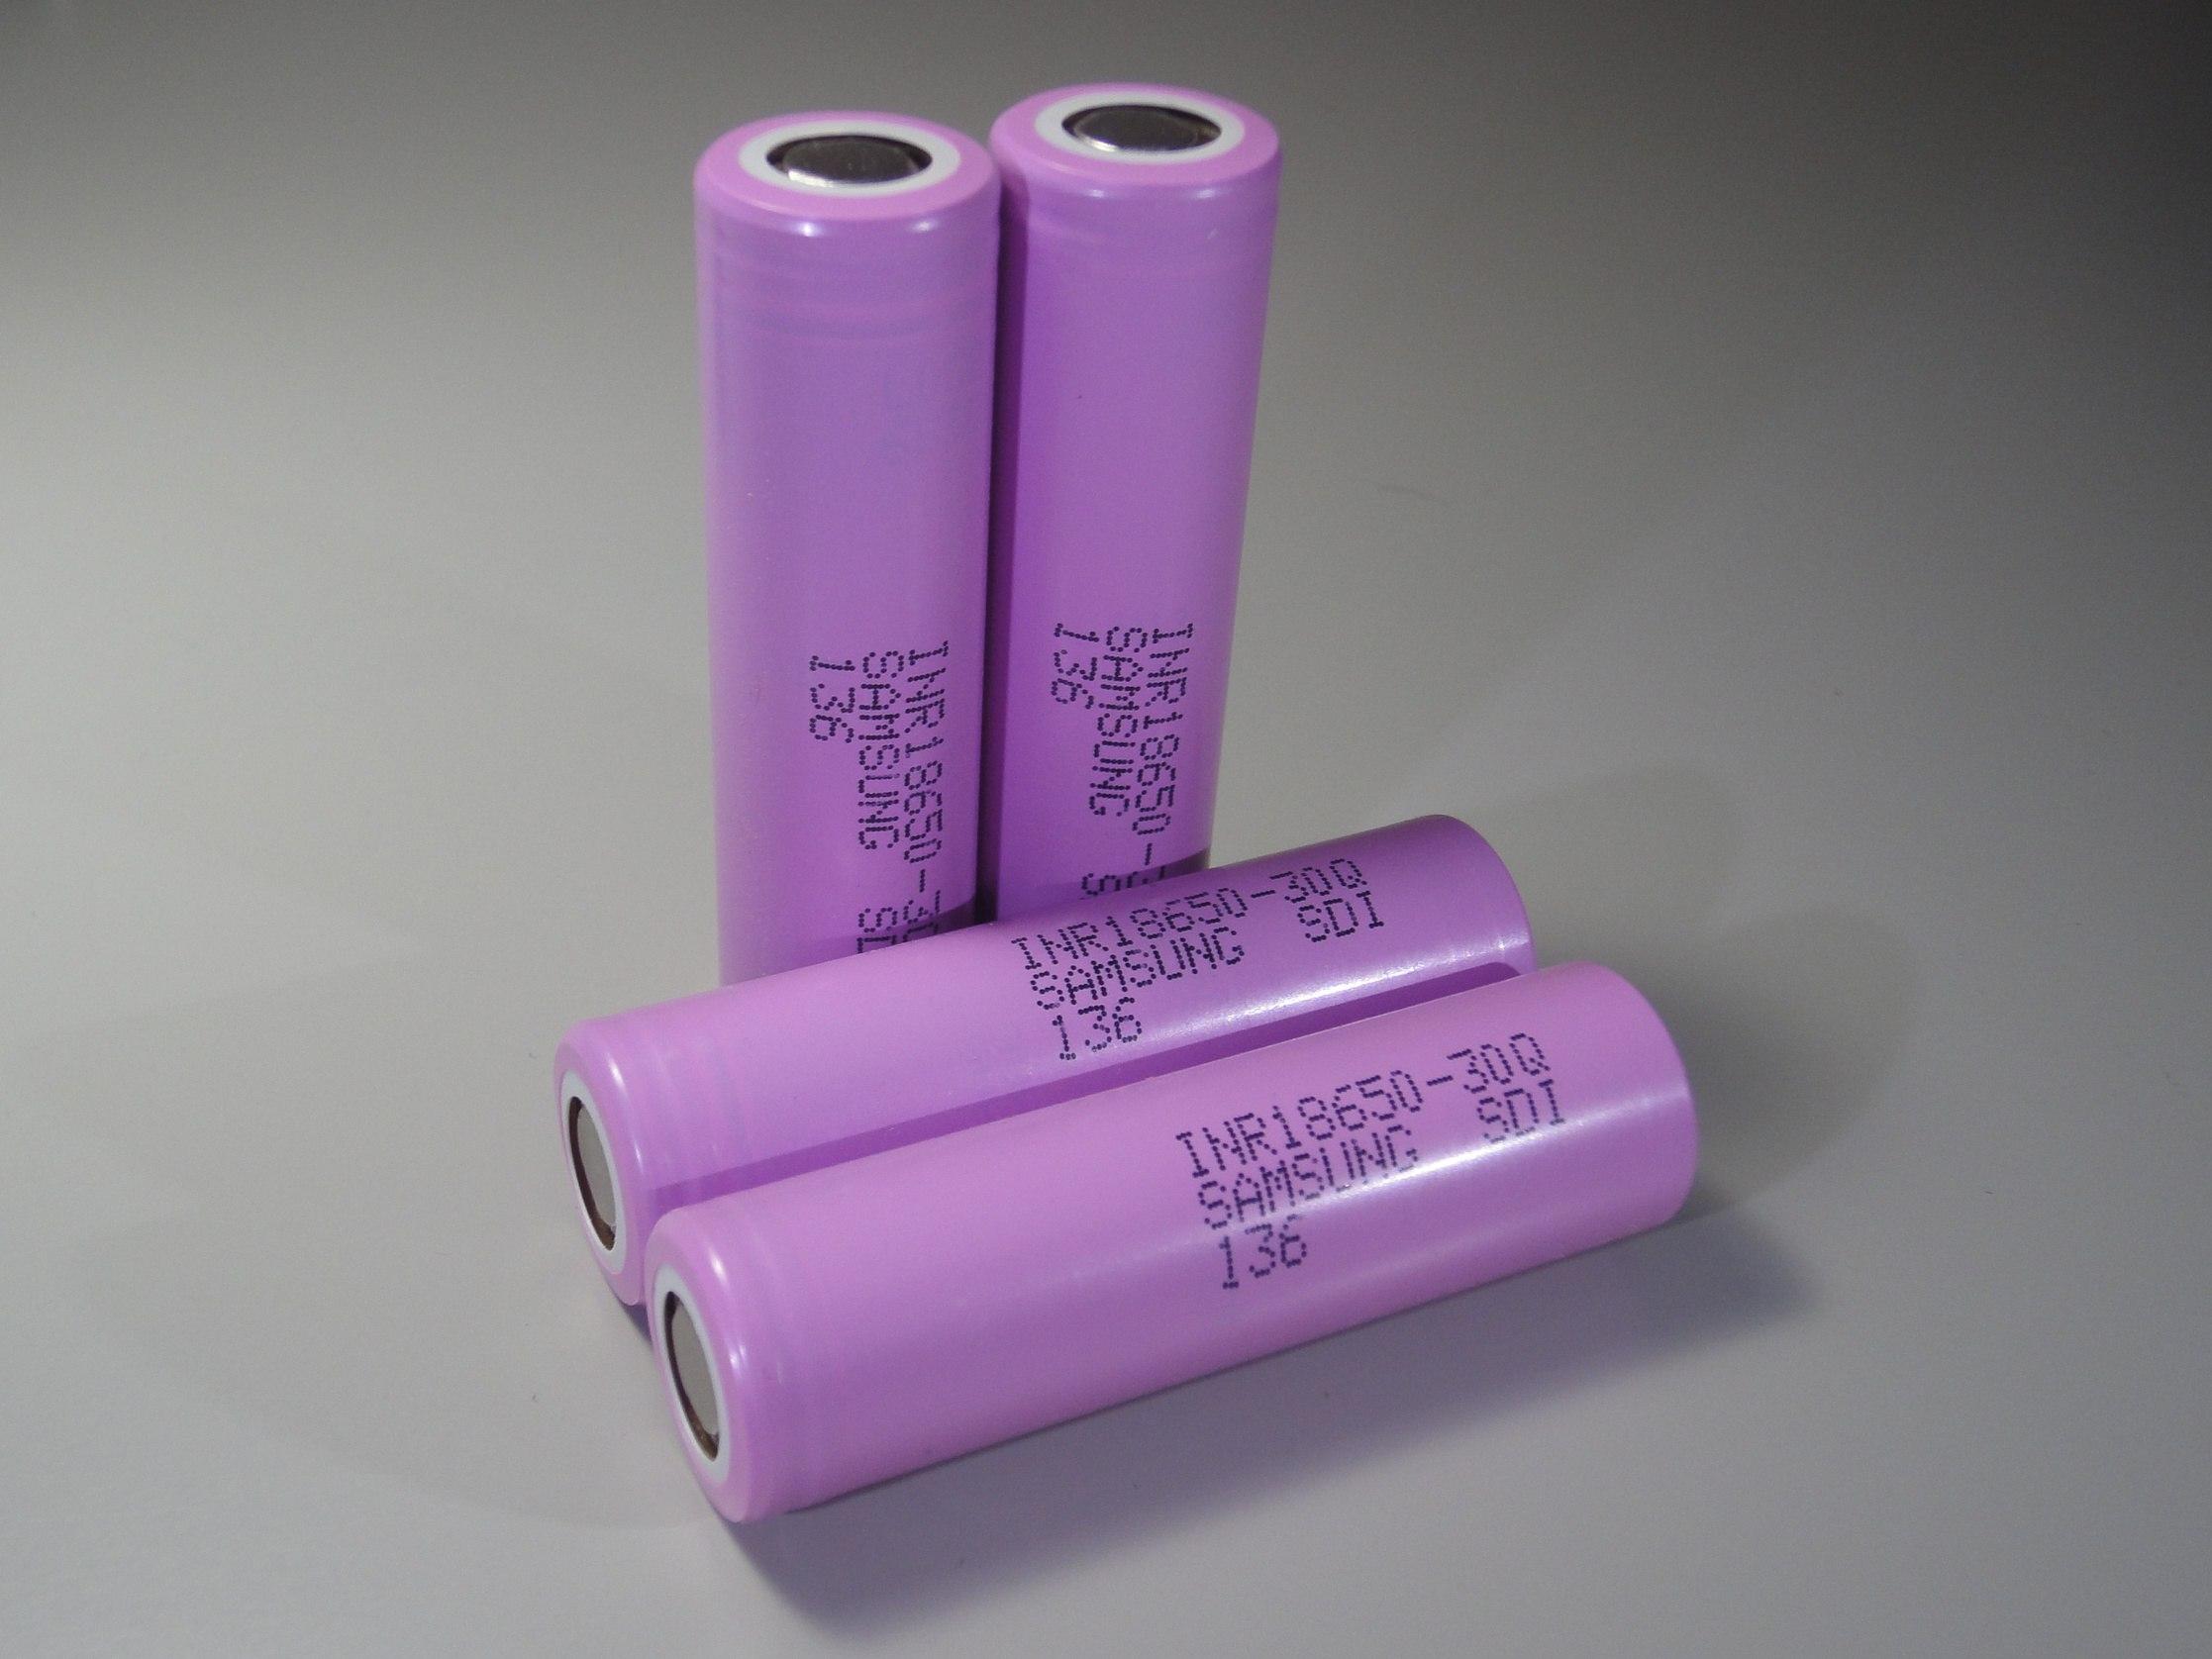 Продам аккумуляторы, разные зарядки, BMS, корпуса для батарей [НСК + пересыл]